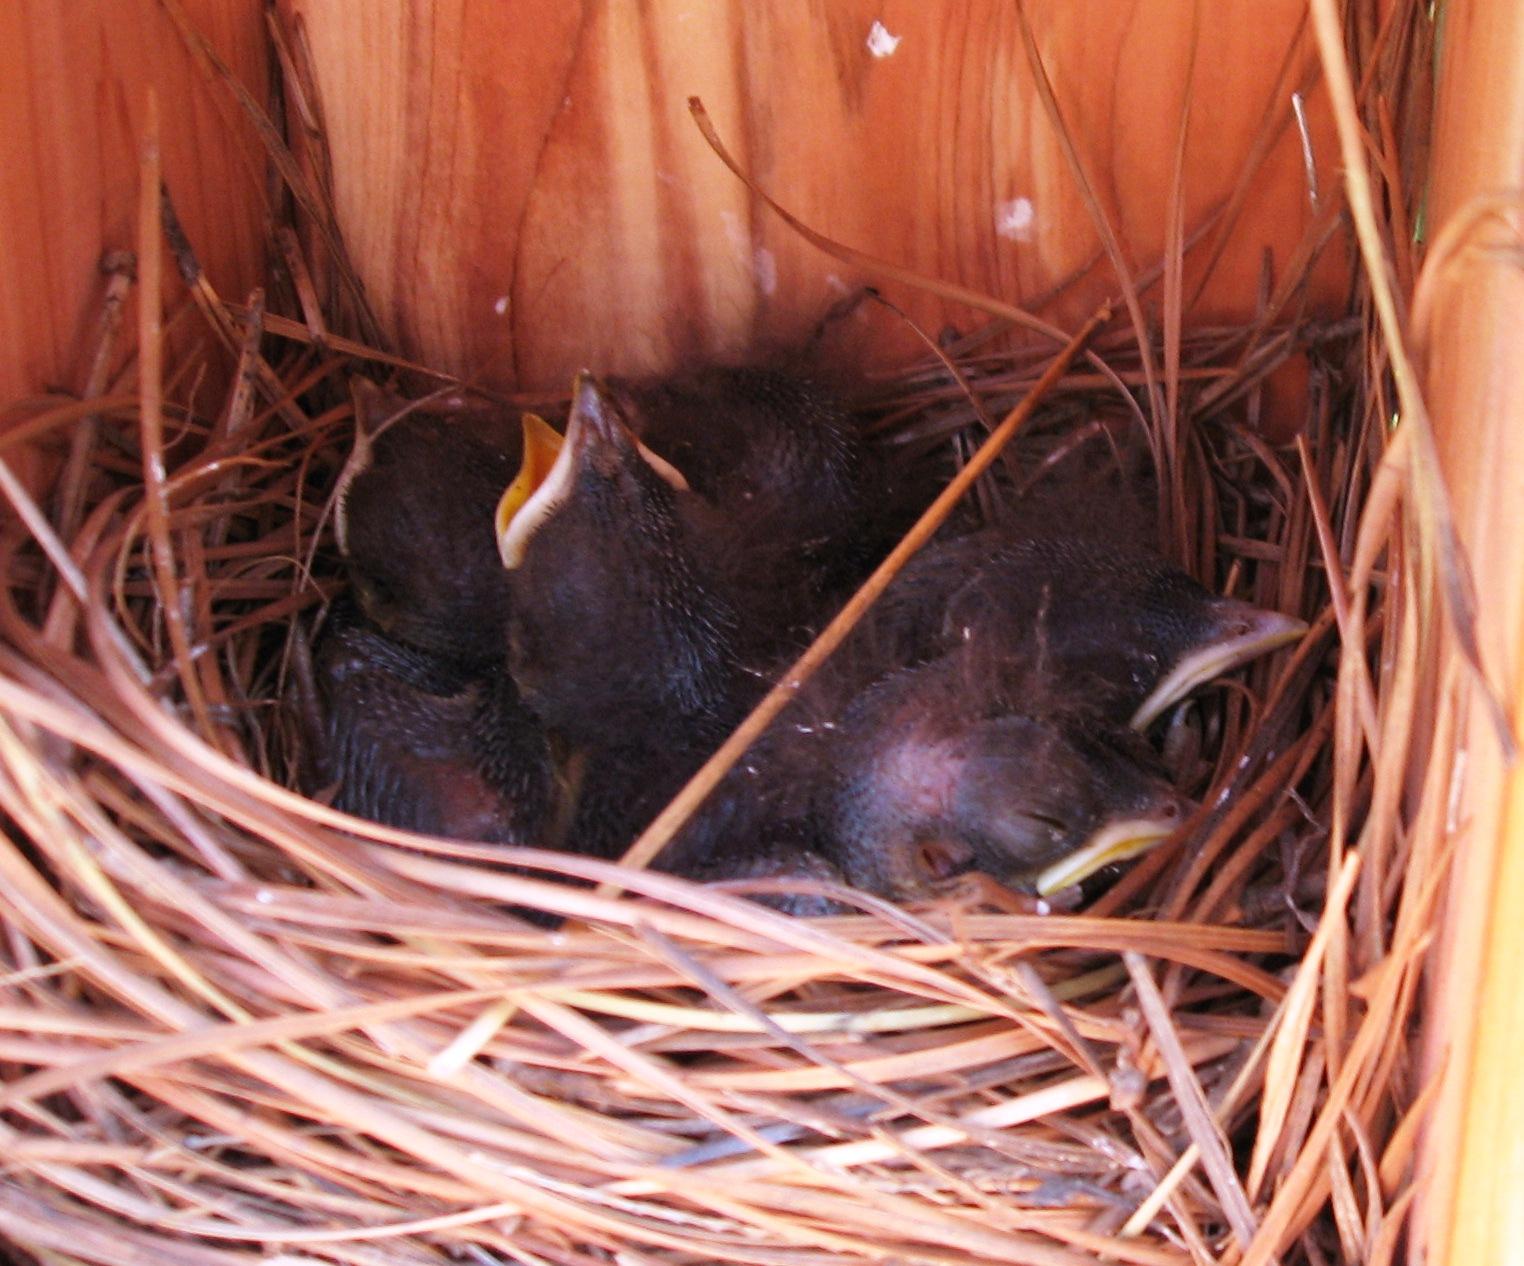 Day 8, baby bluebirds